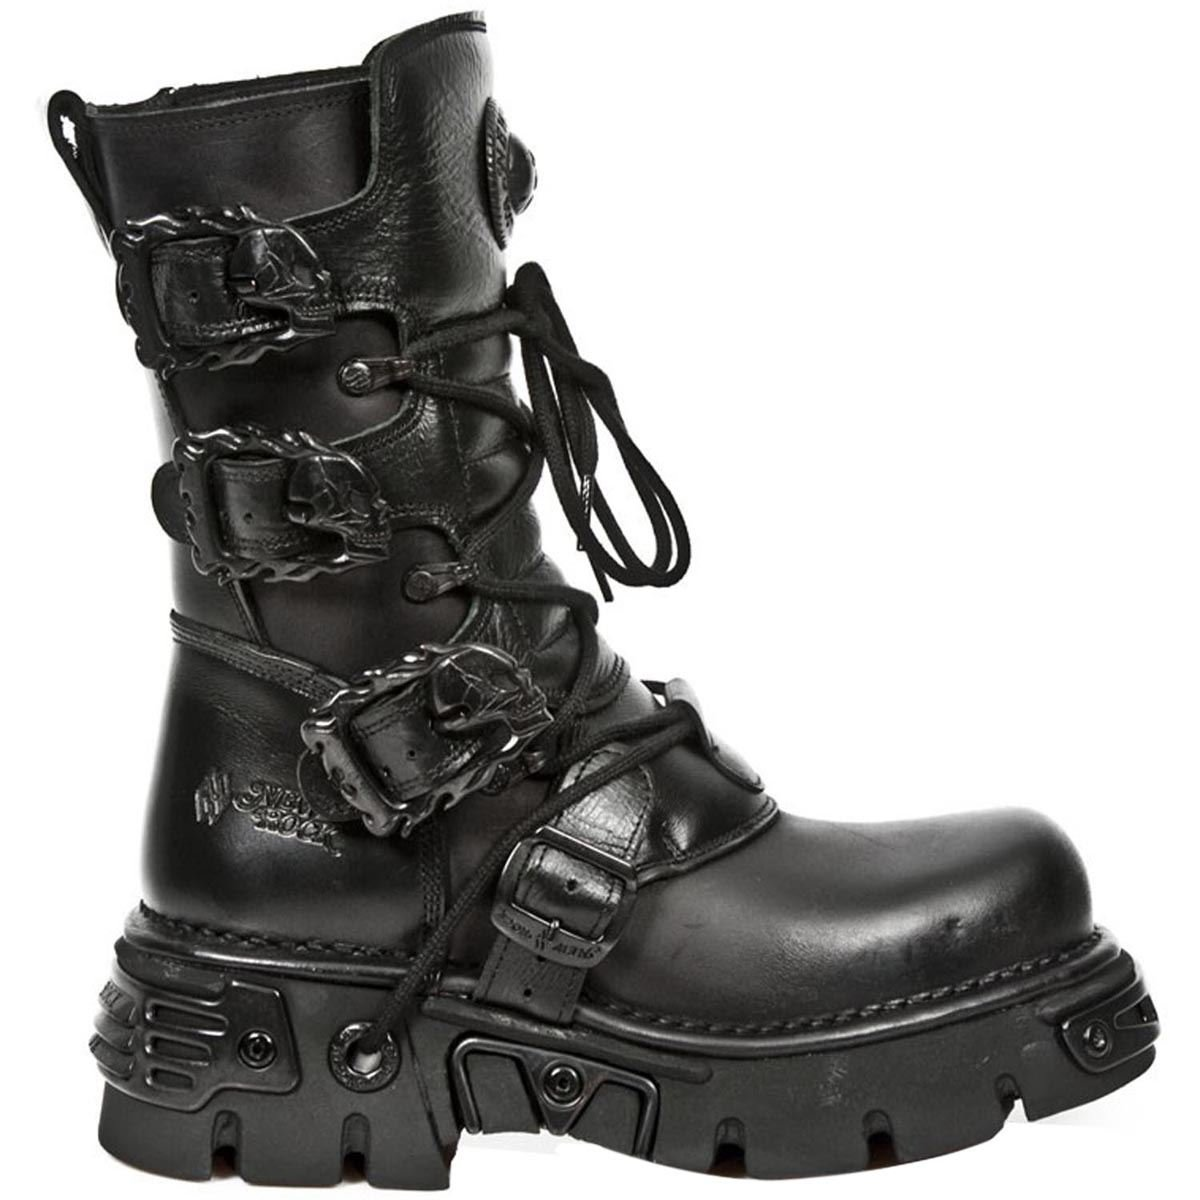 New Rock Shoes - All Black Boots with Reactor Soles B00NSXEEVW 39 M EU|ブラック ブラック 39 M EU